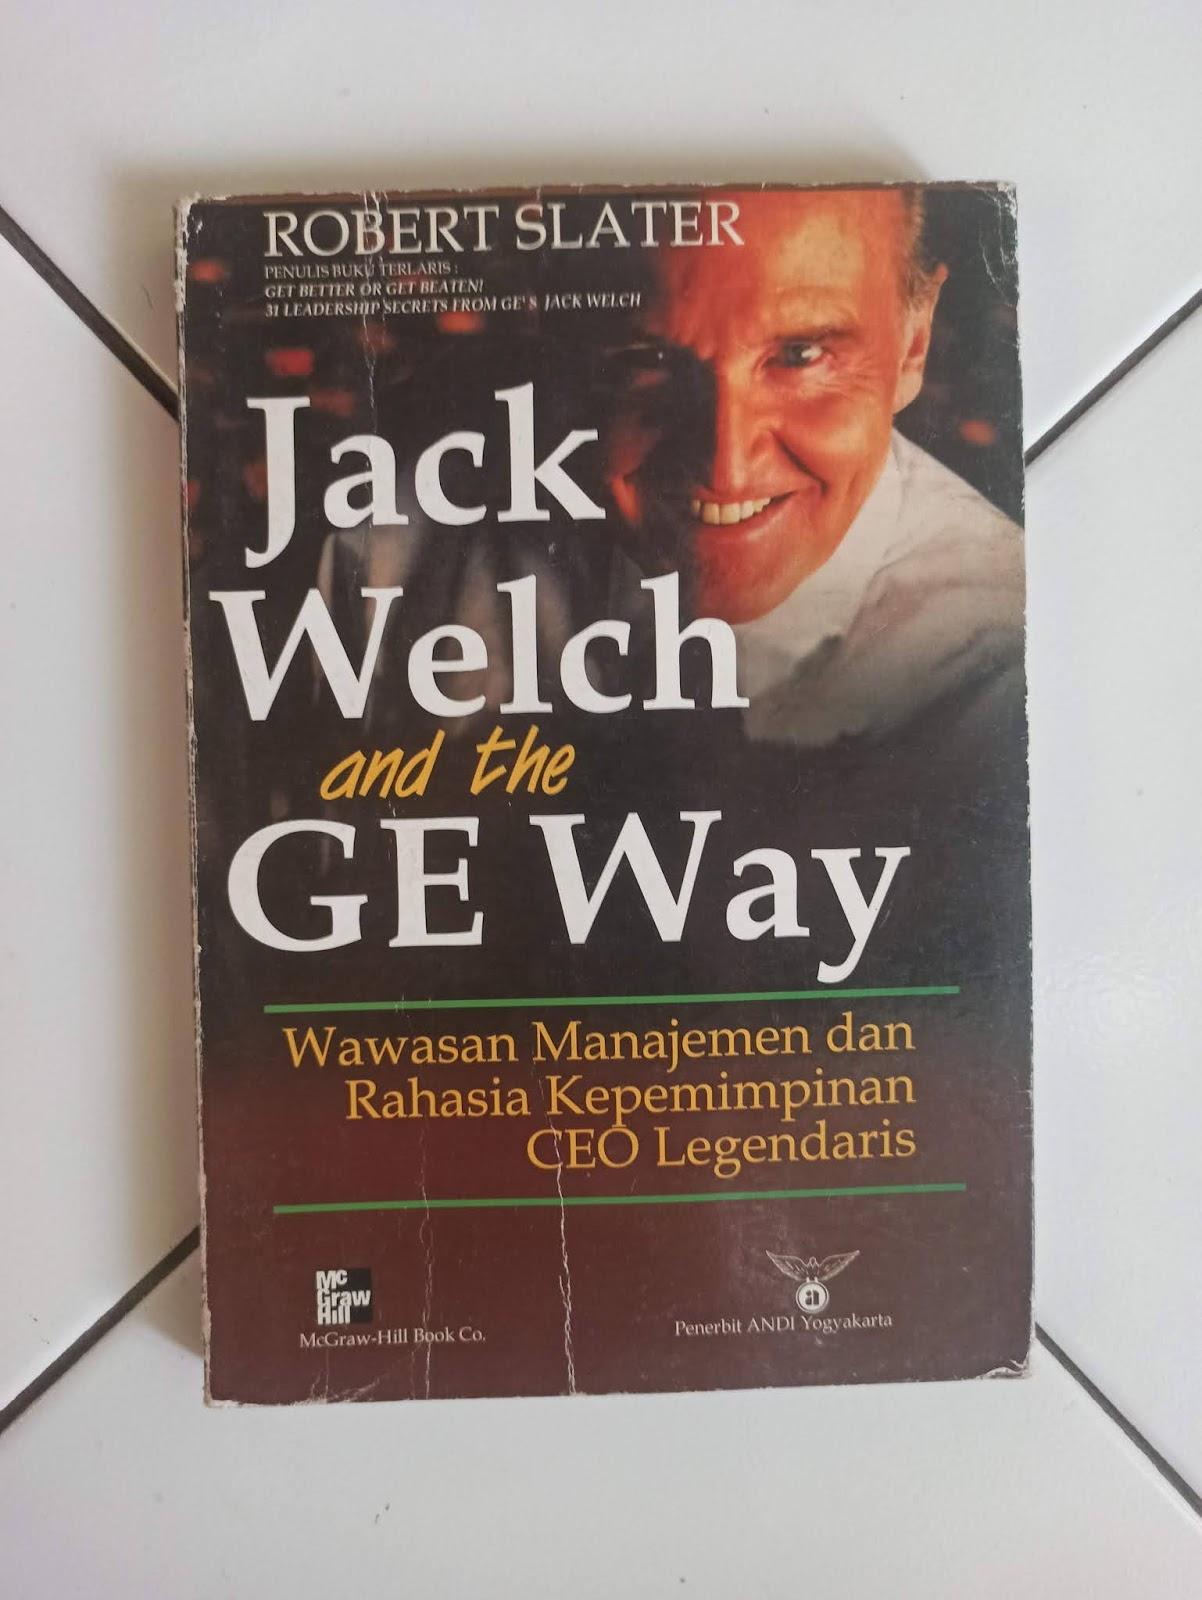 Buku Bekas Jack Welch And The GE Way